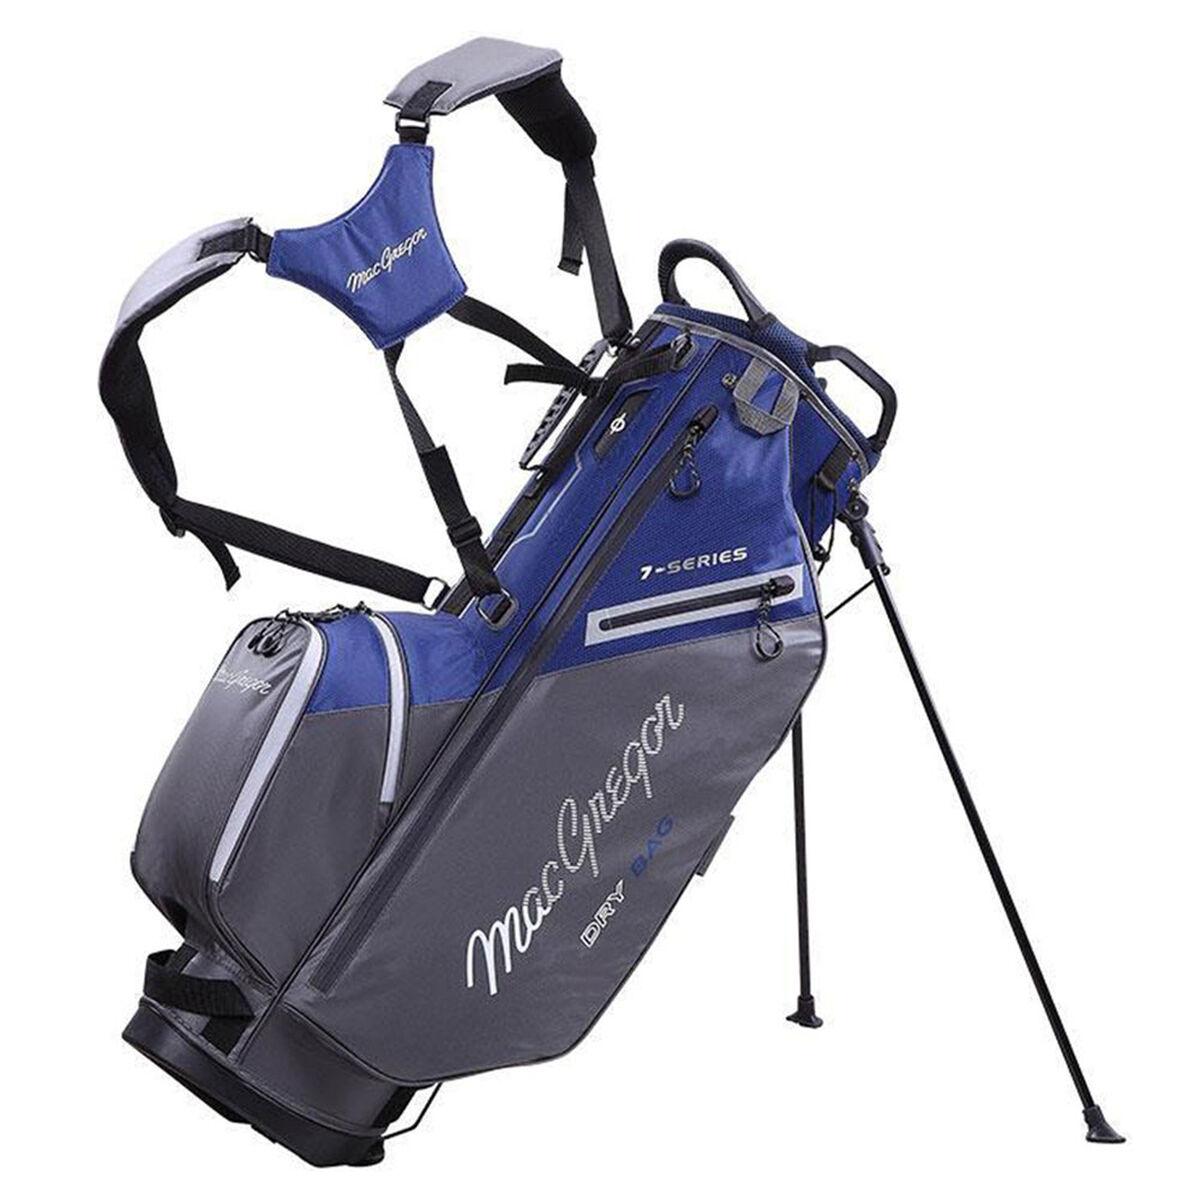 MacGregor 7-Series Water-Resistant Golf Stand Bag, Navy/grey   American Golf